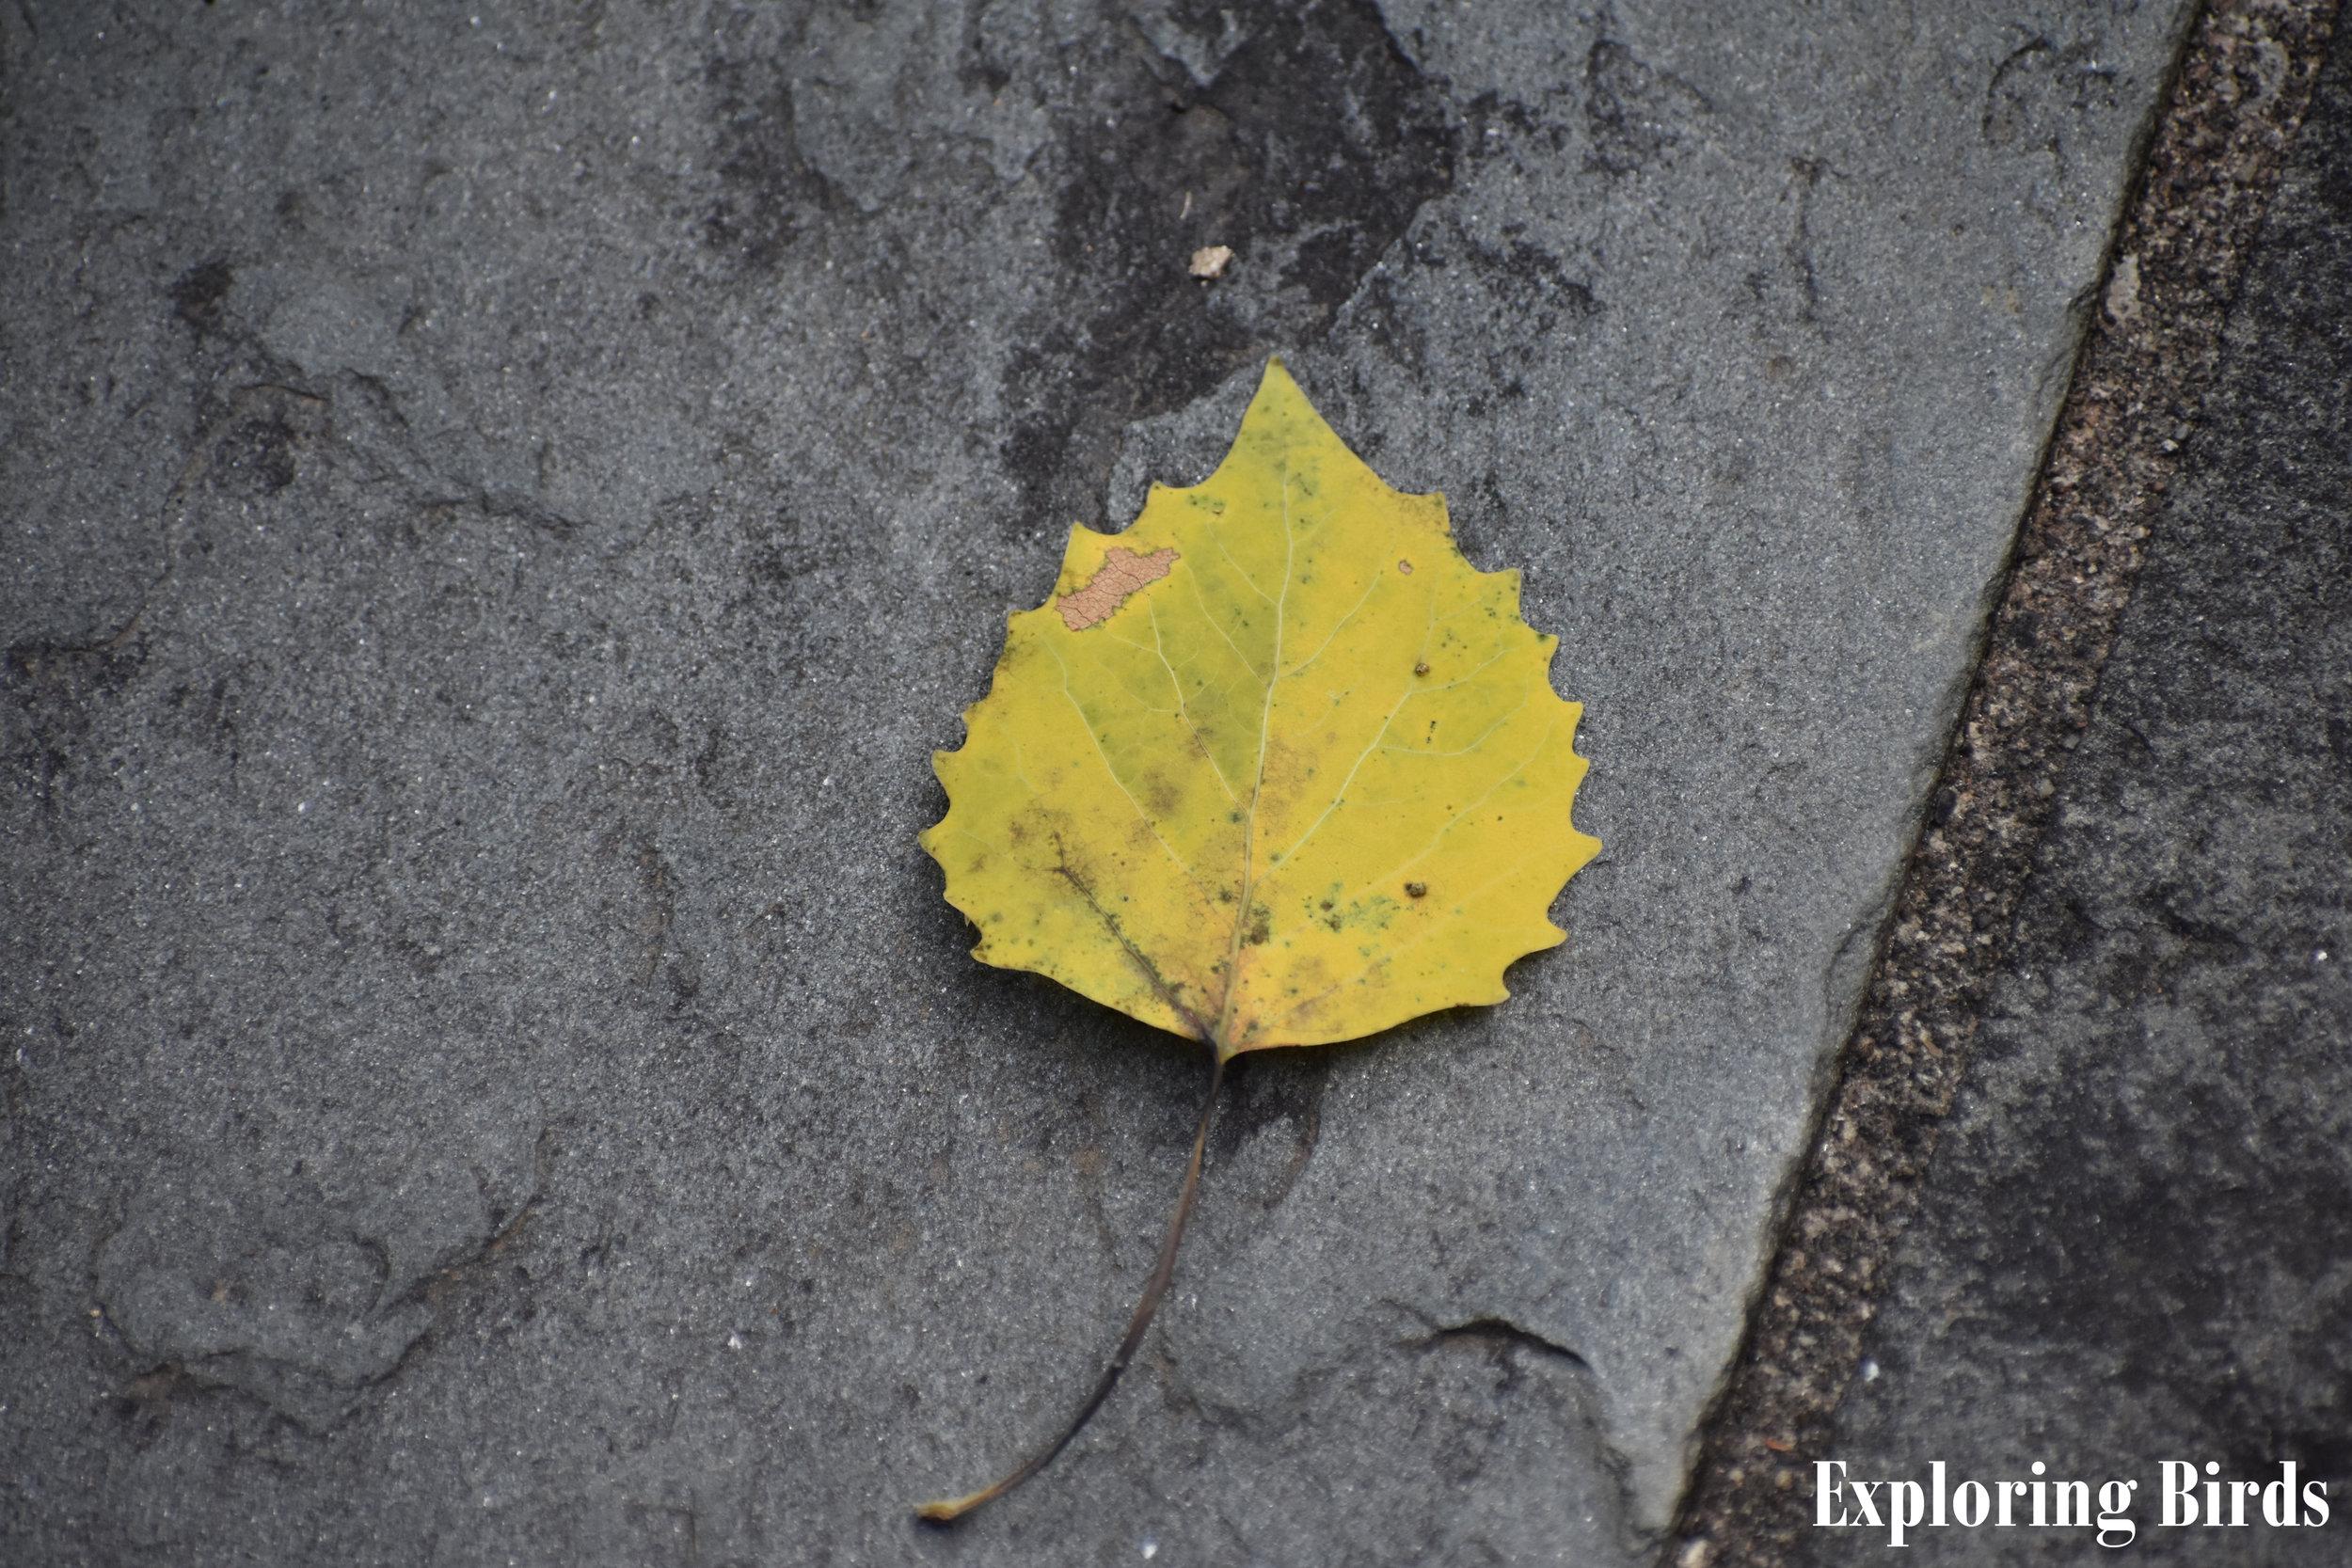 Bigtooth Aspen leaf identification